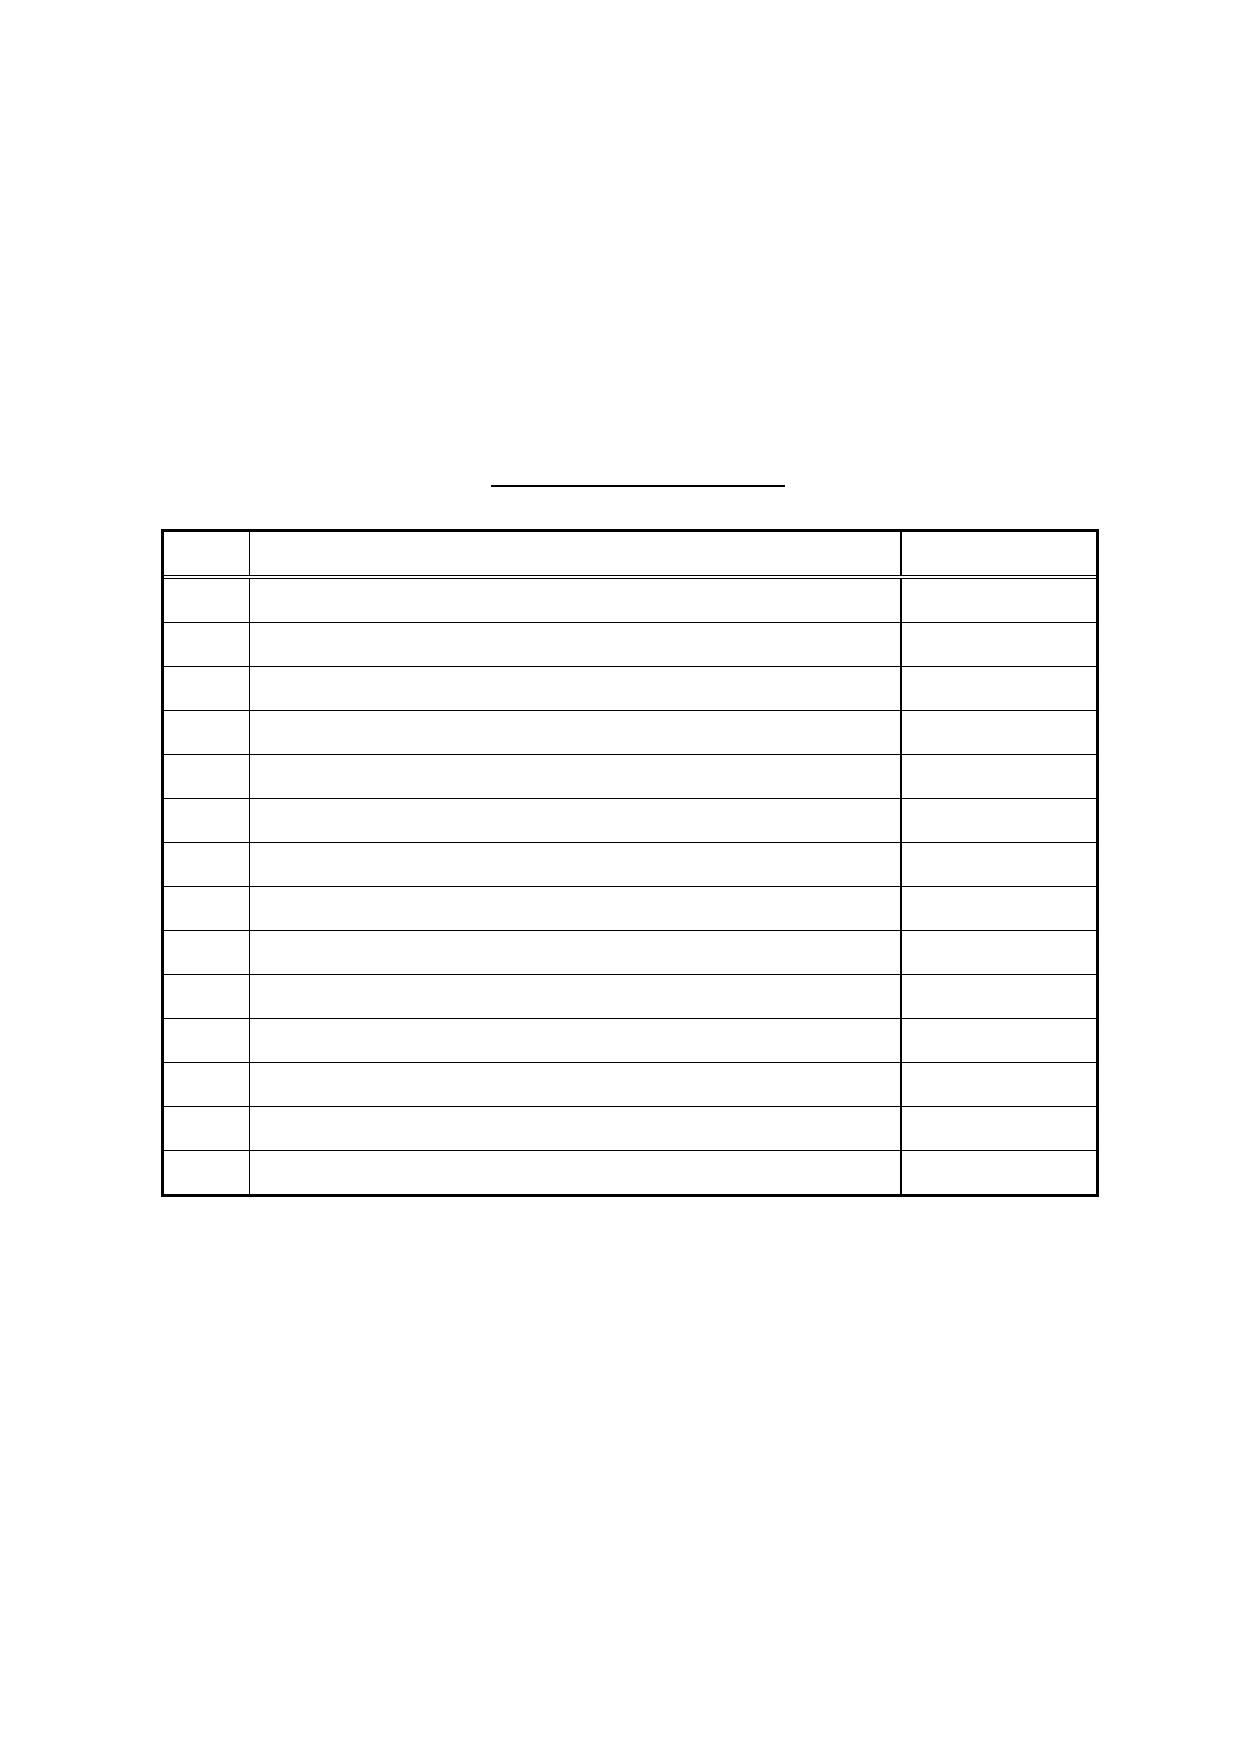 T-51863D150J-FW-A-AB pdf